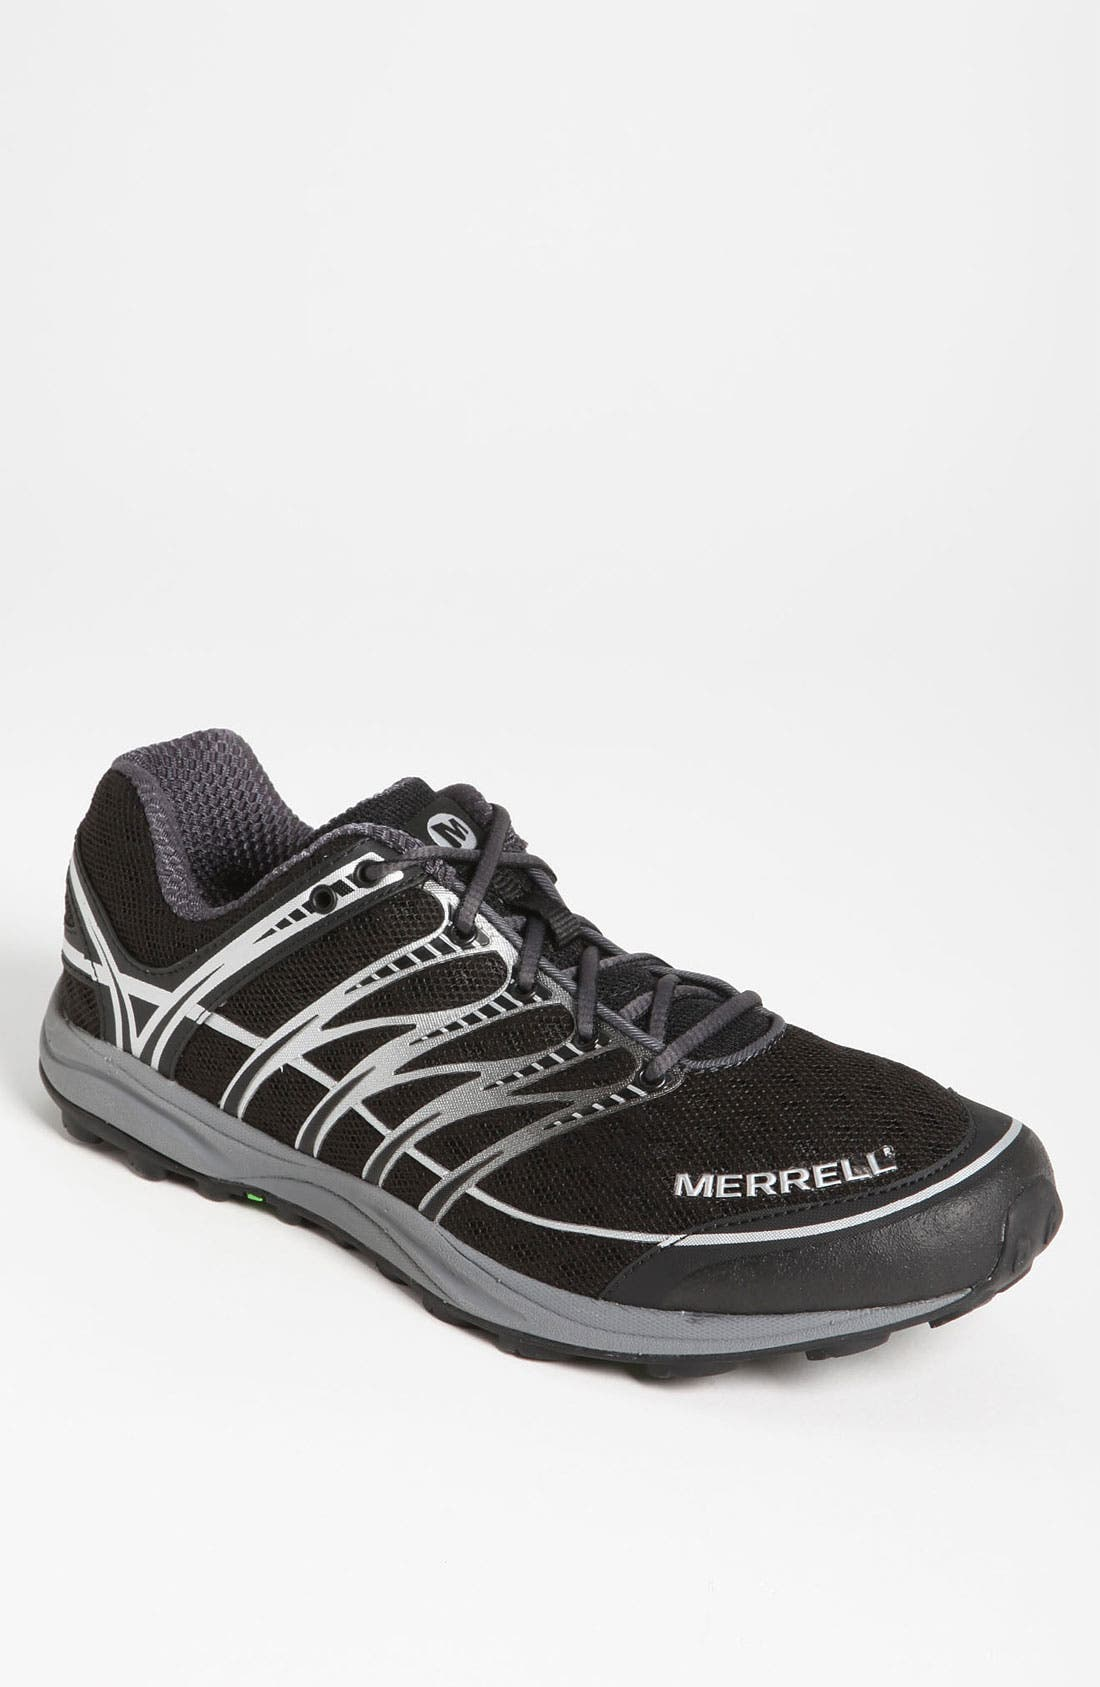 Alternate Image 1 Selected - Merrell 'Mix Master 2' Running Shoe (Men)